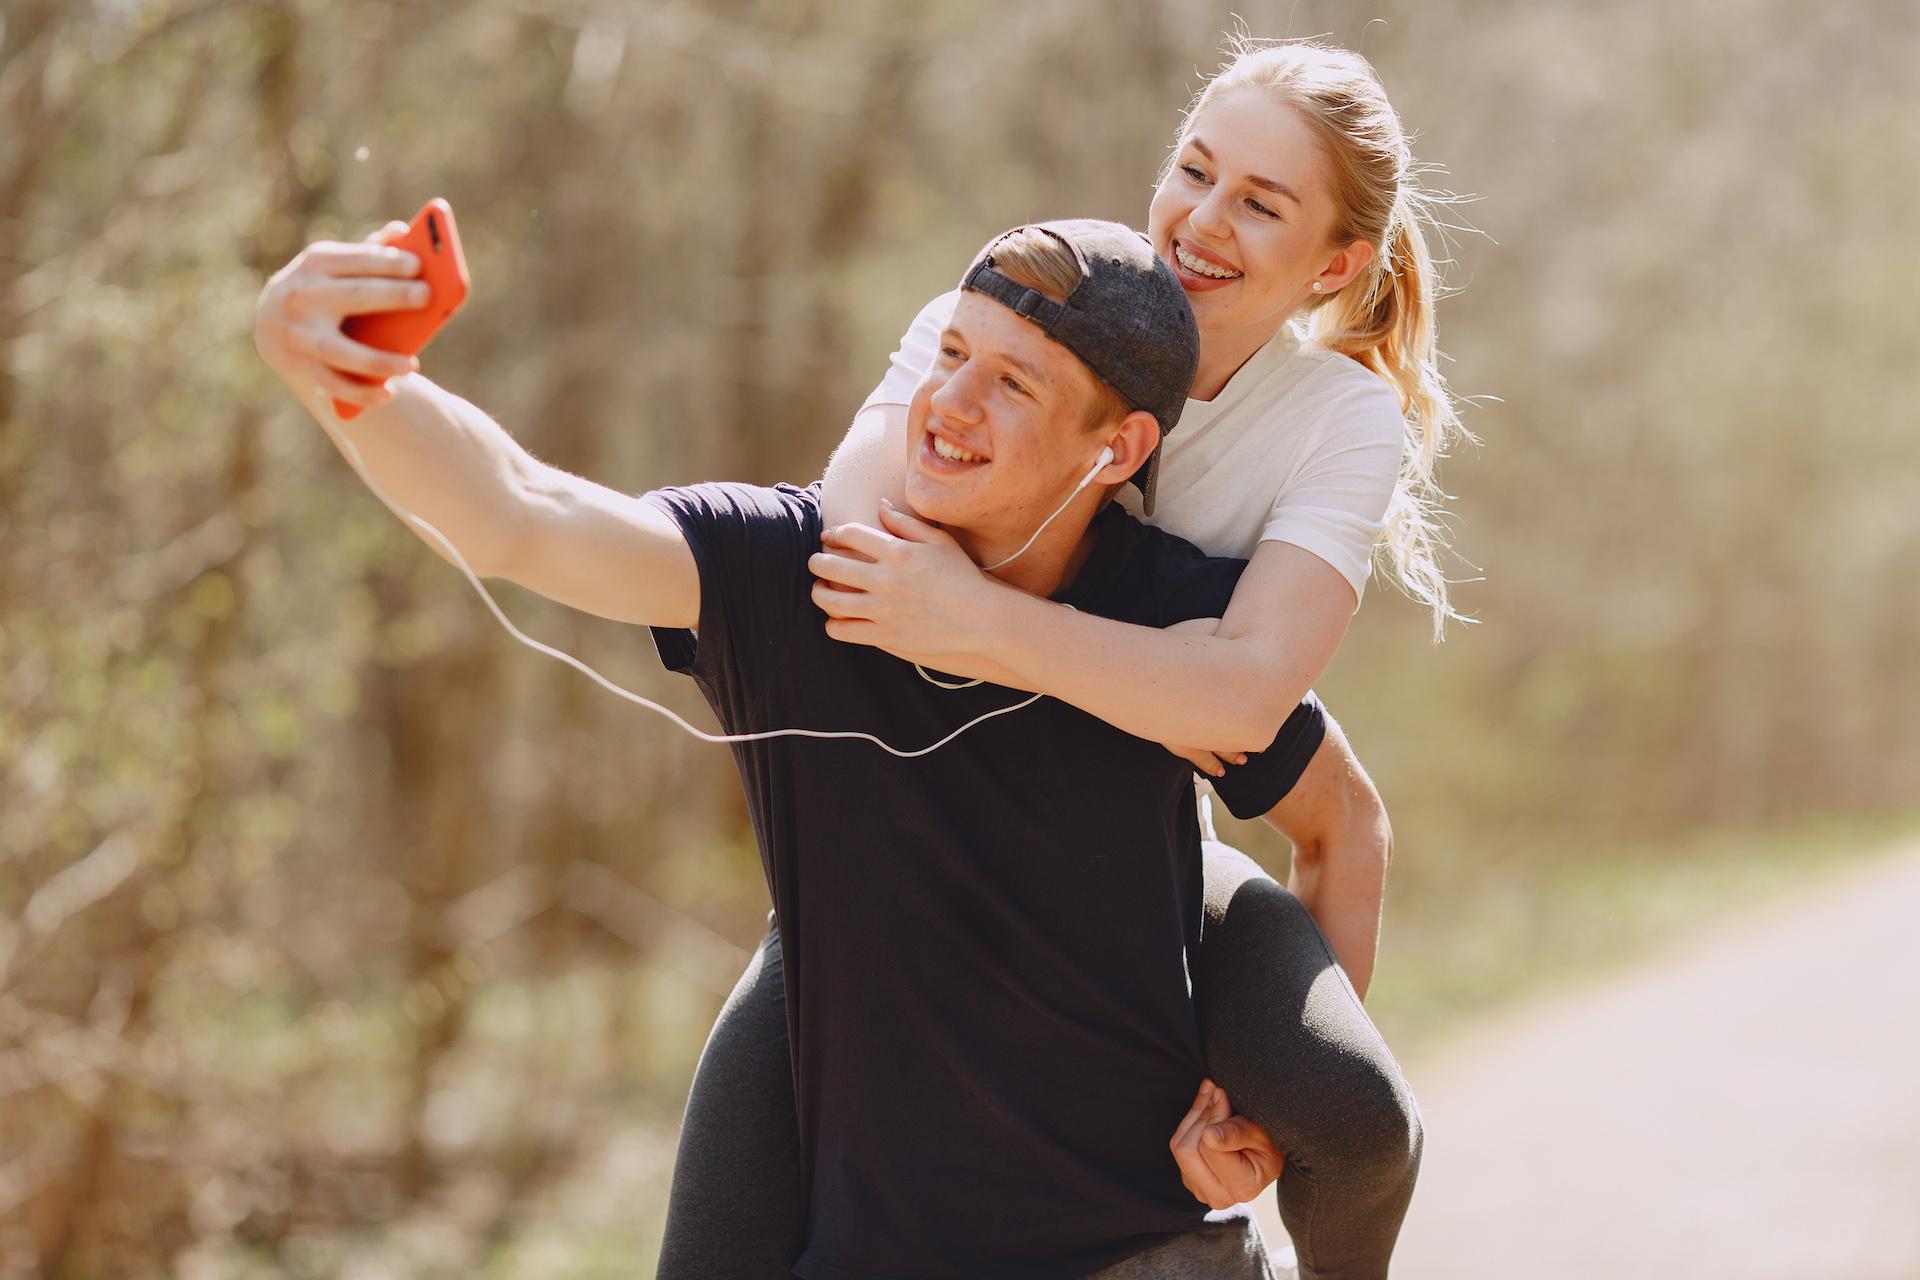 photo-of-couple-taking-selfie-4148953.jpg